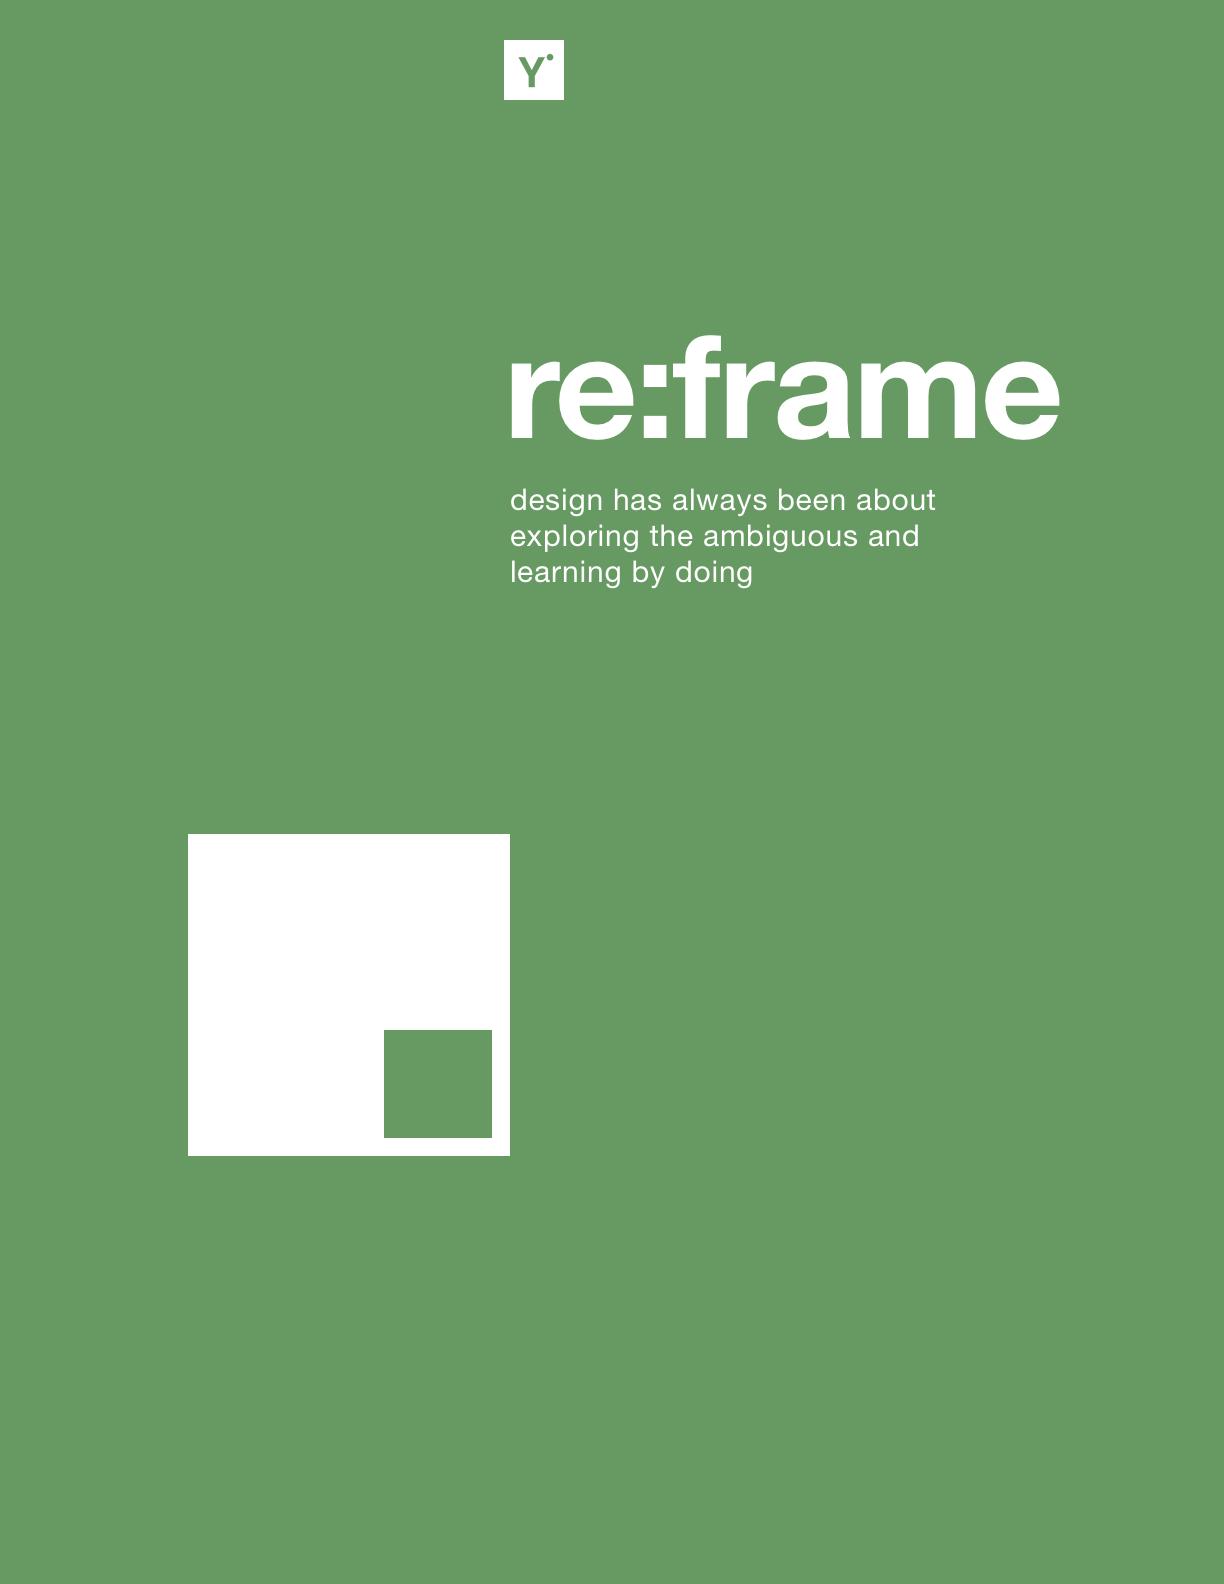 Re:frame@2x